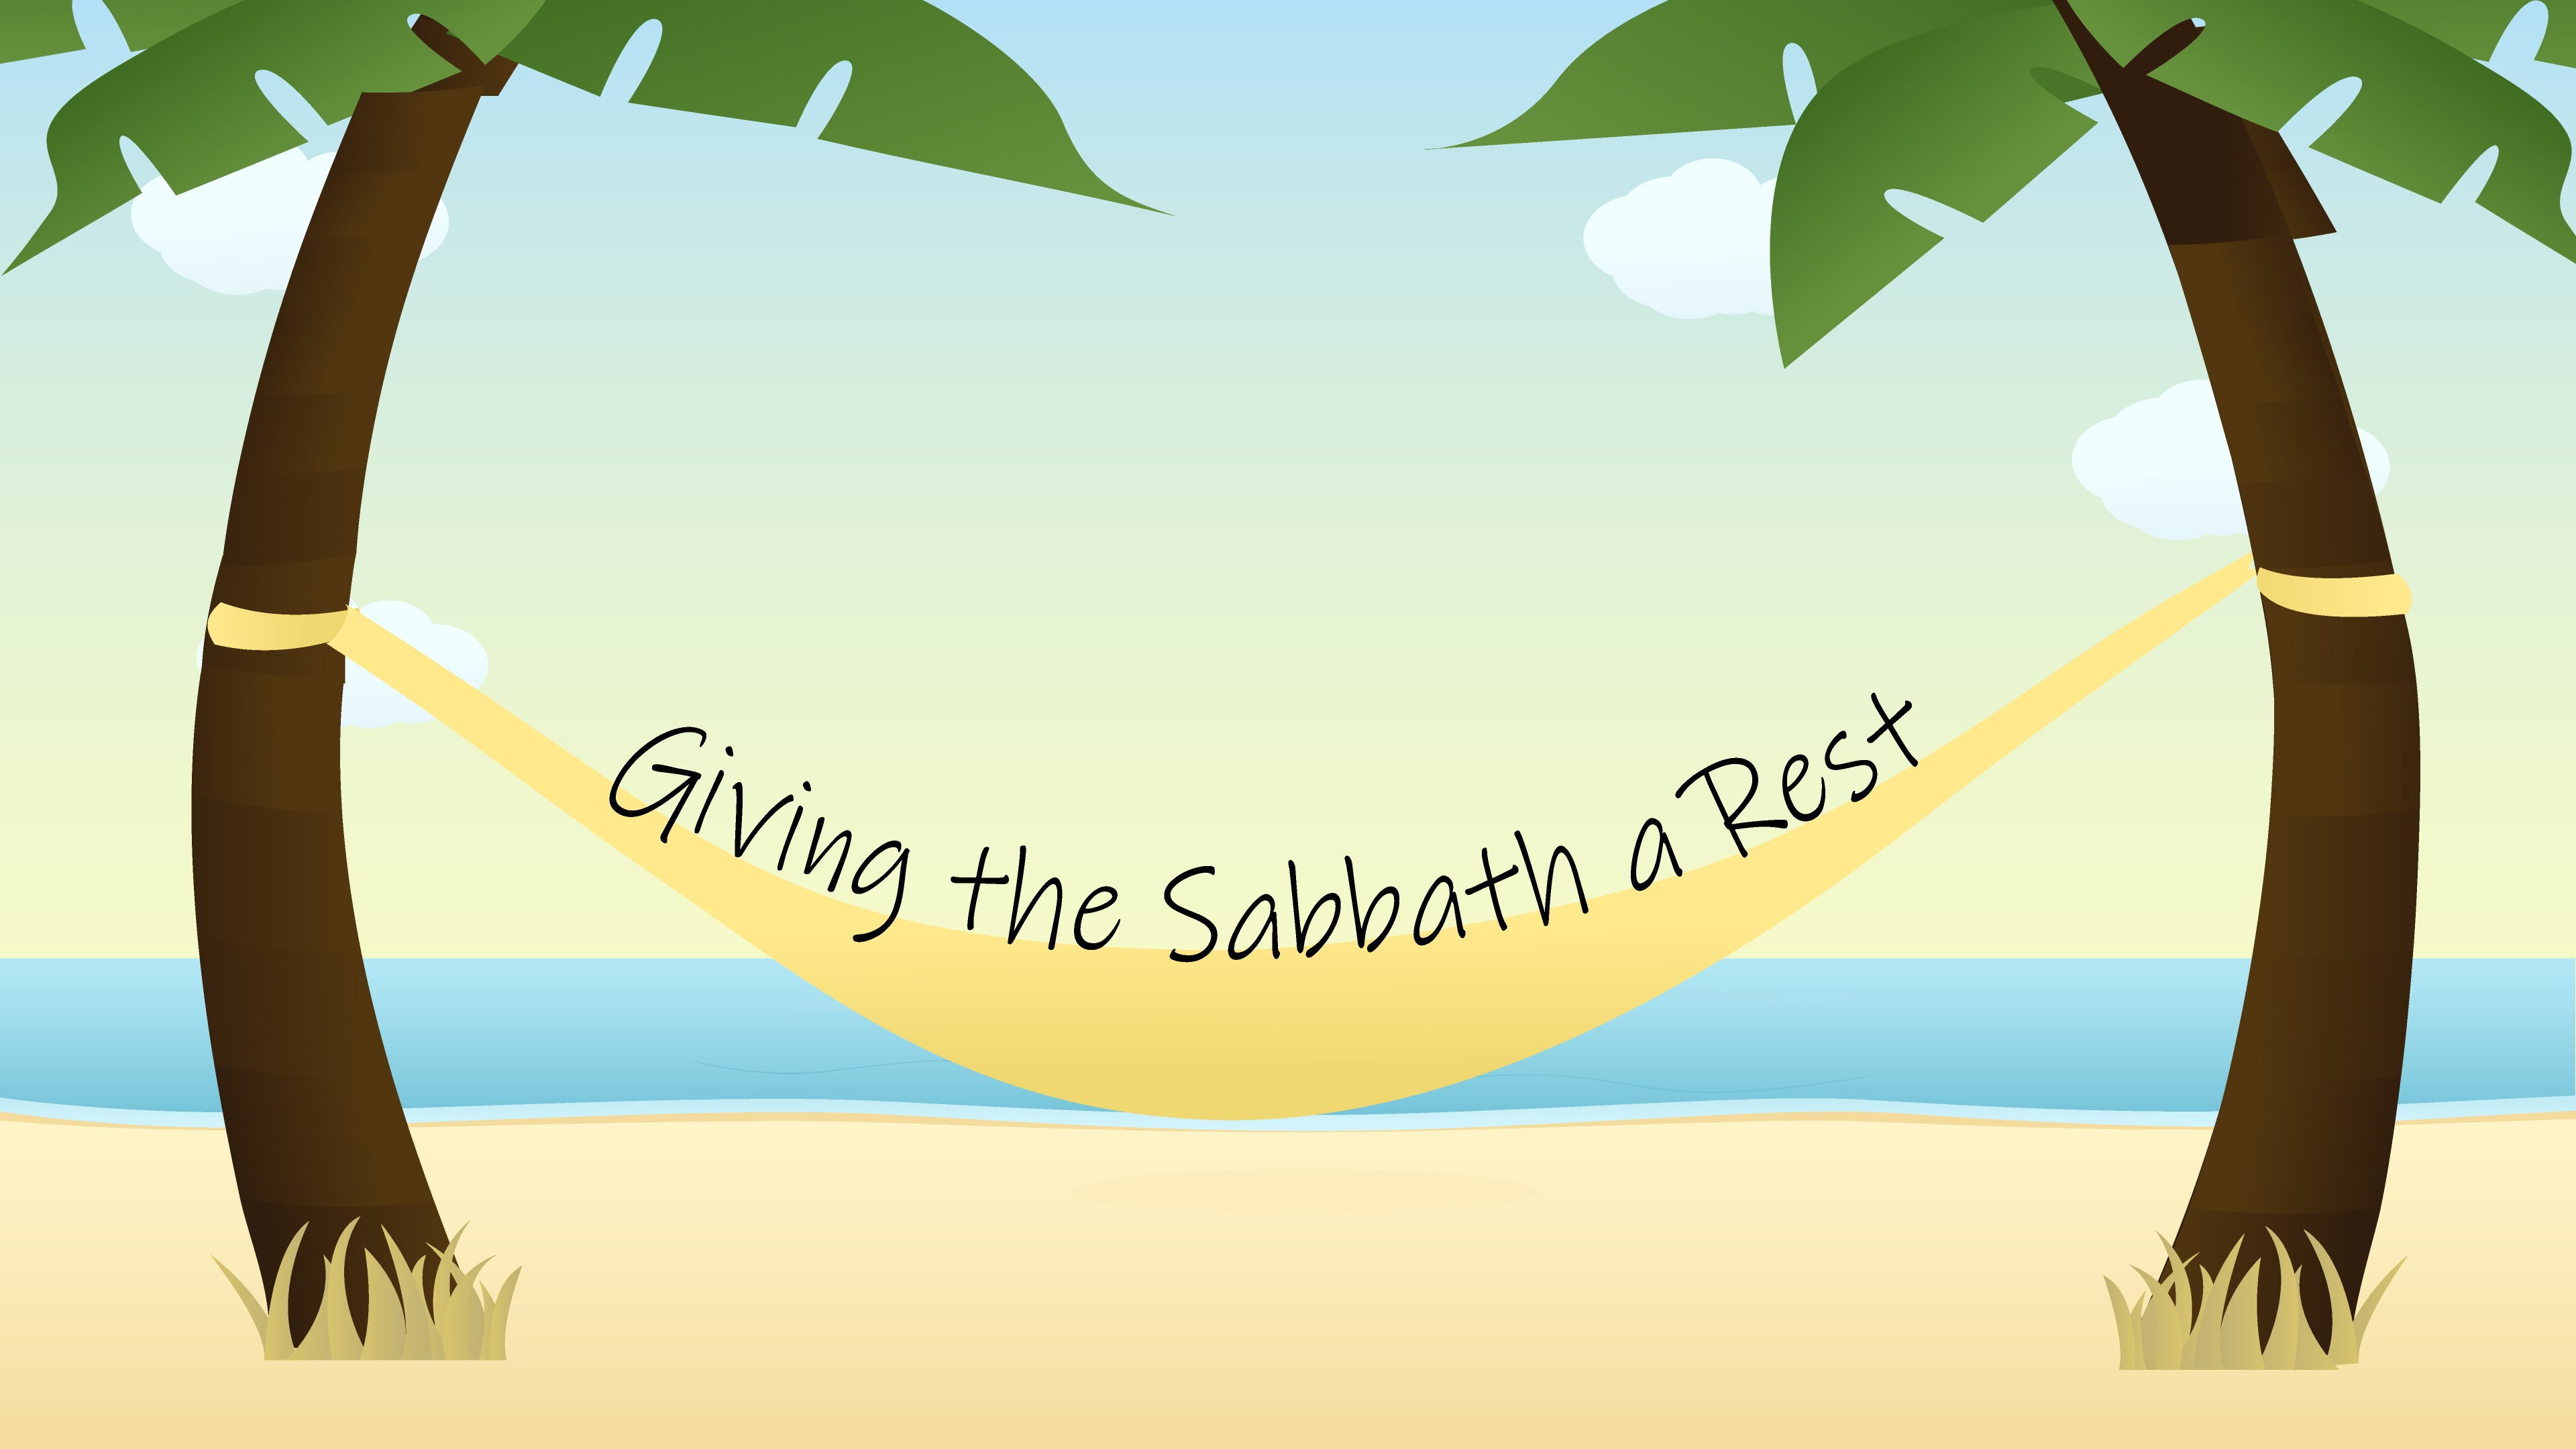 Giving the Sabbath a Rest